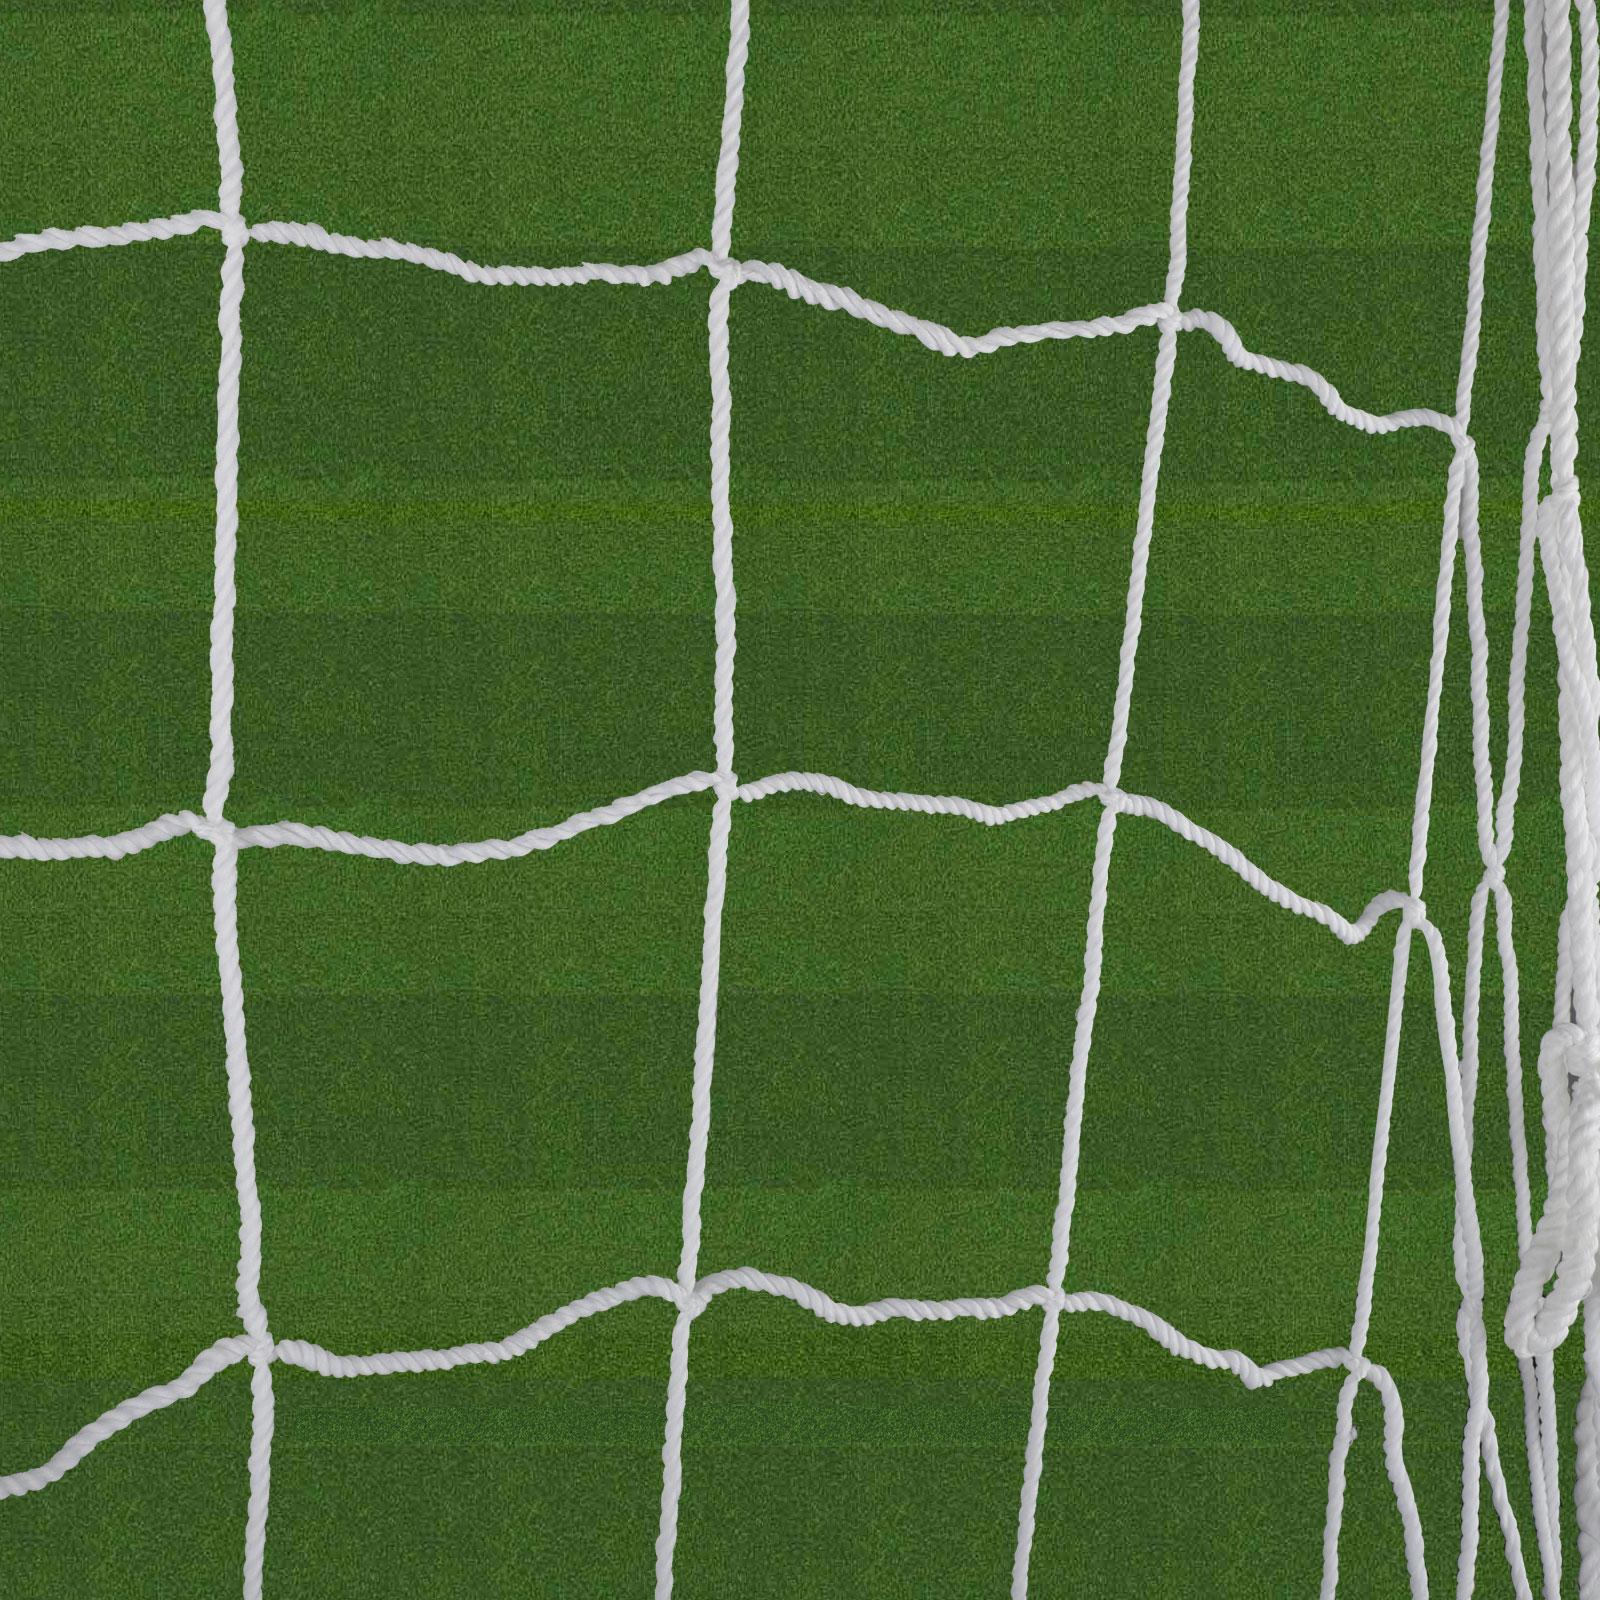 6-4ft-PE-Football-Soccer-Goal-Net-Outdoor-Backyard-Sport-Match-Training-for-Kids thumbnail 6